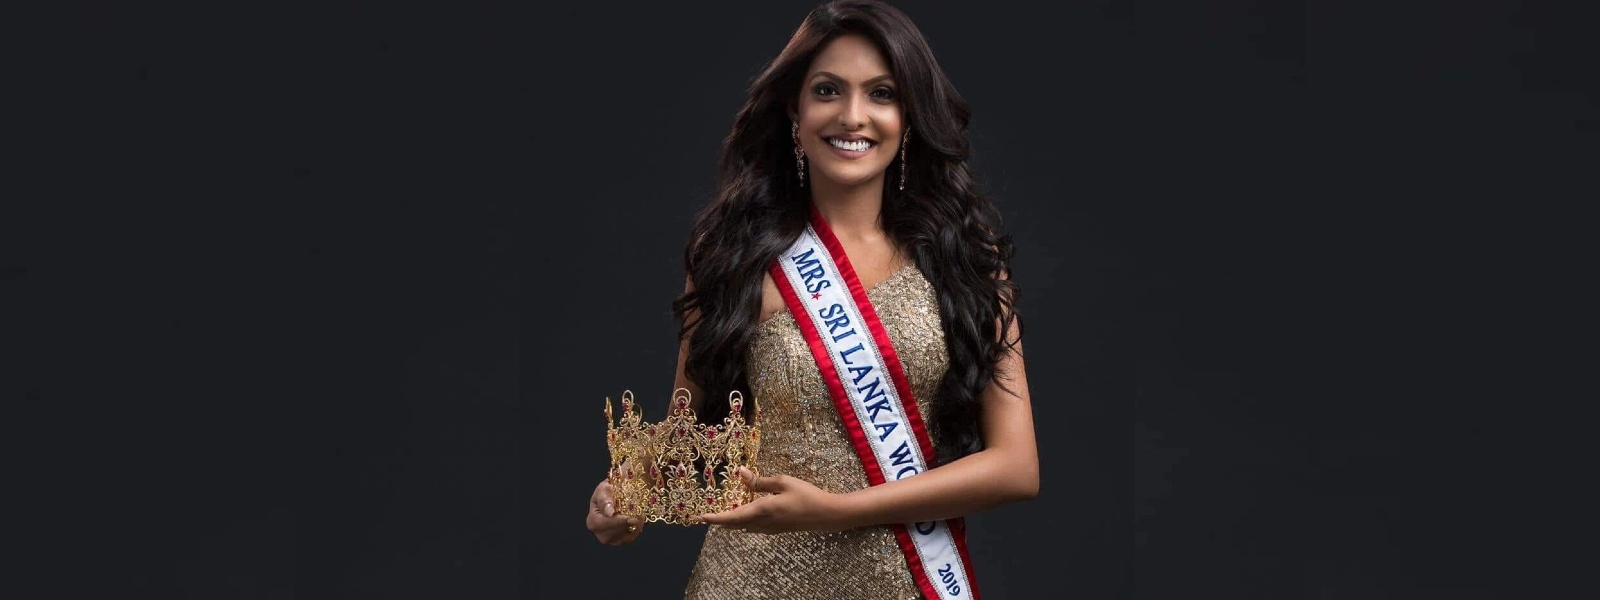 Regulate Beauty Pageants in Sri Lanka, says Former Mrs. World Caroline Jurie